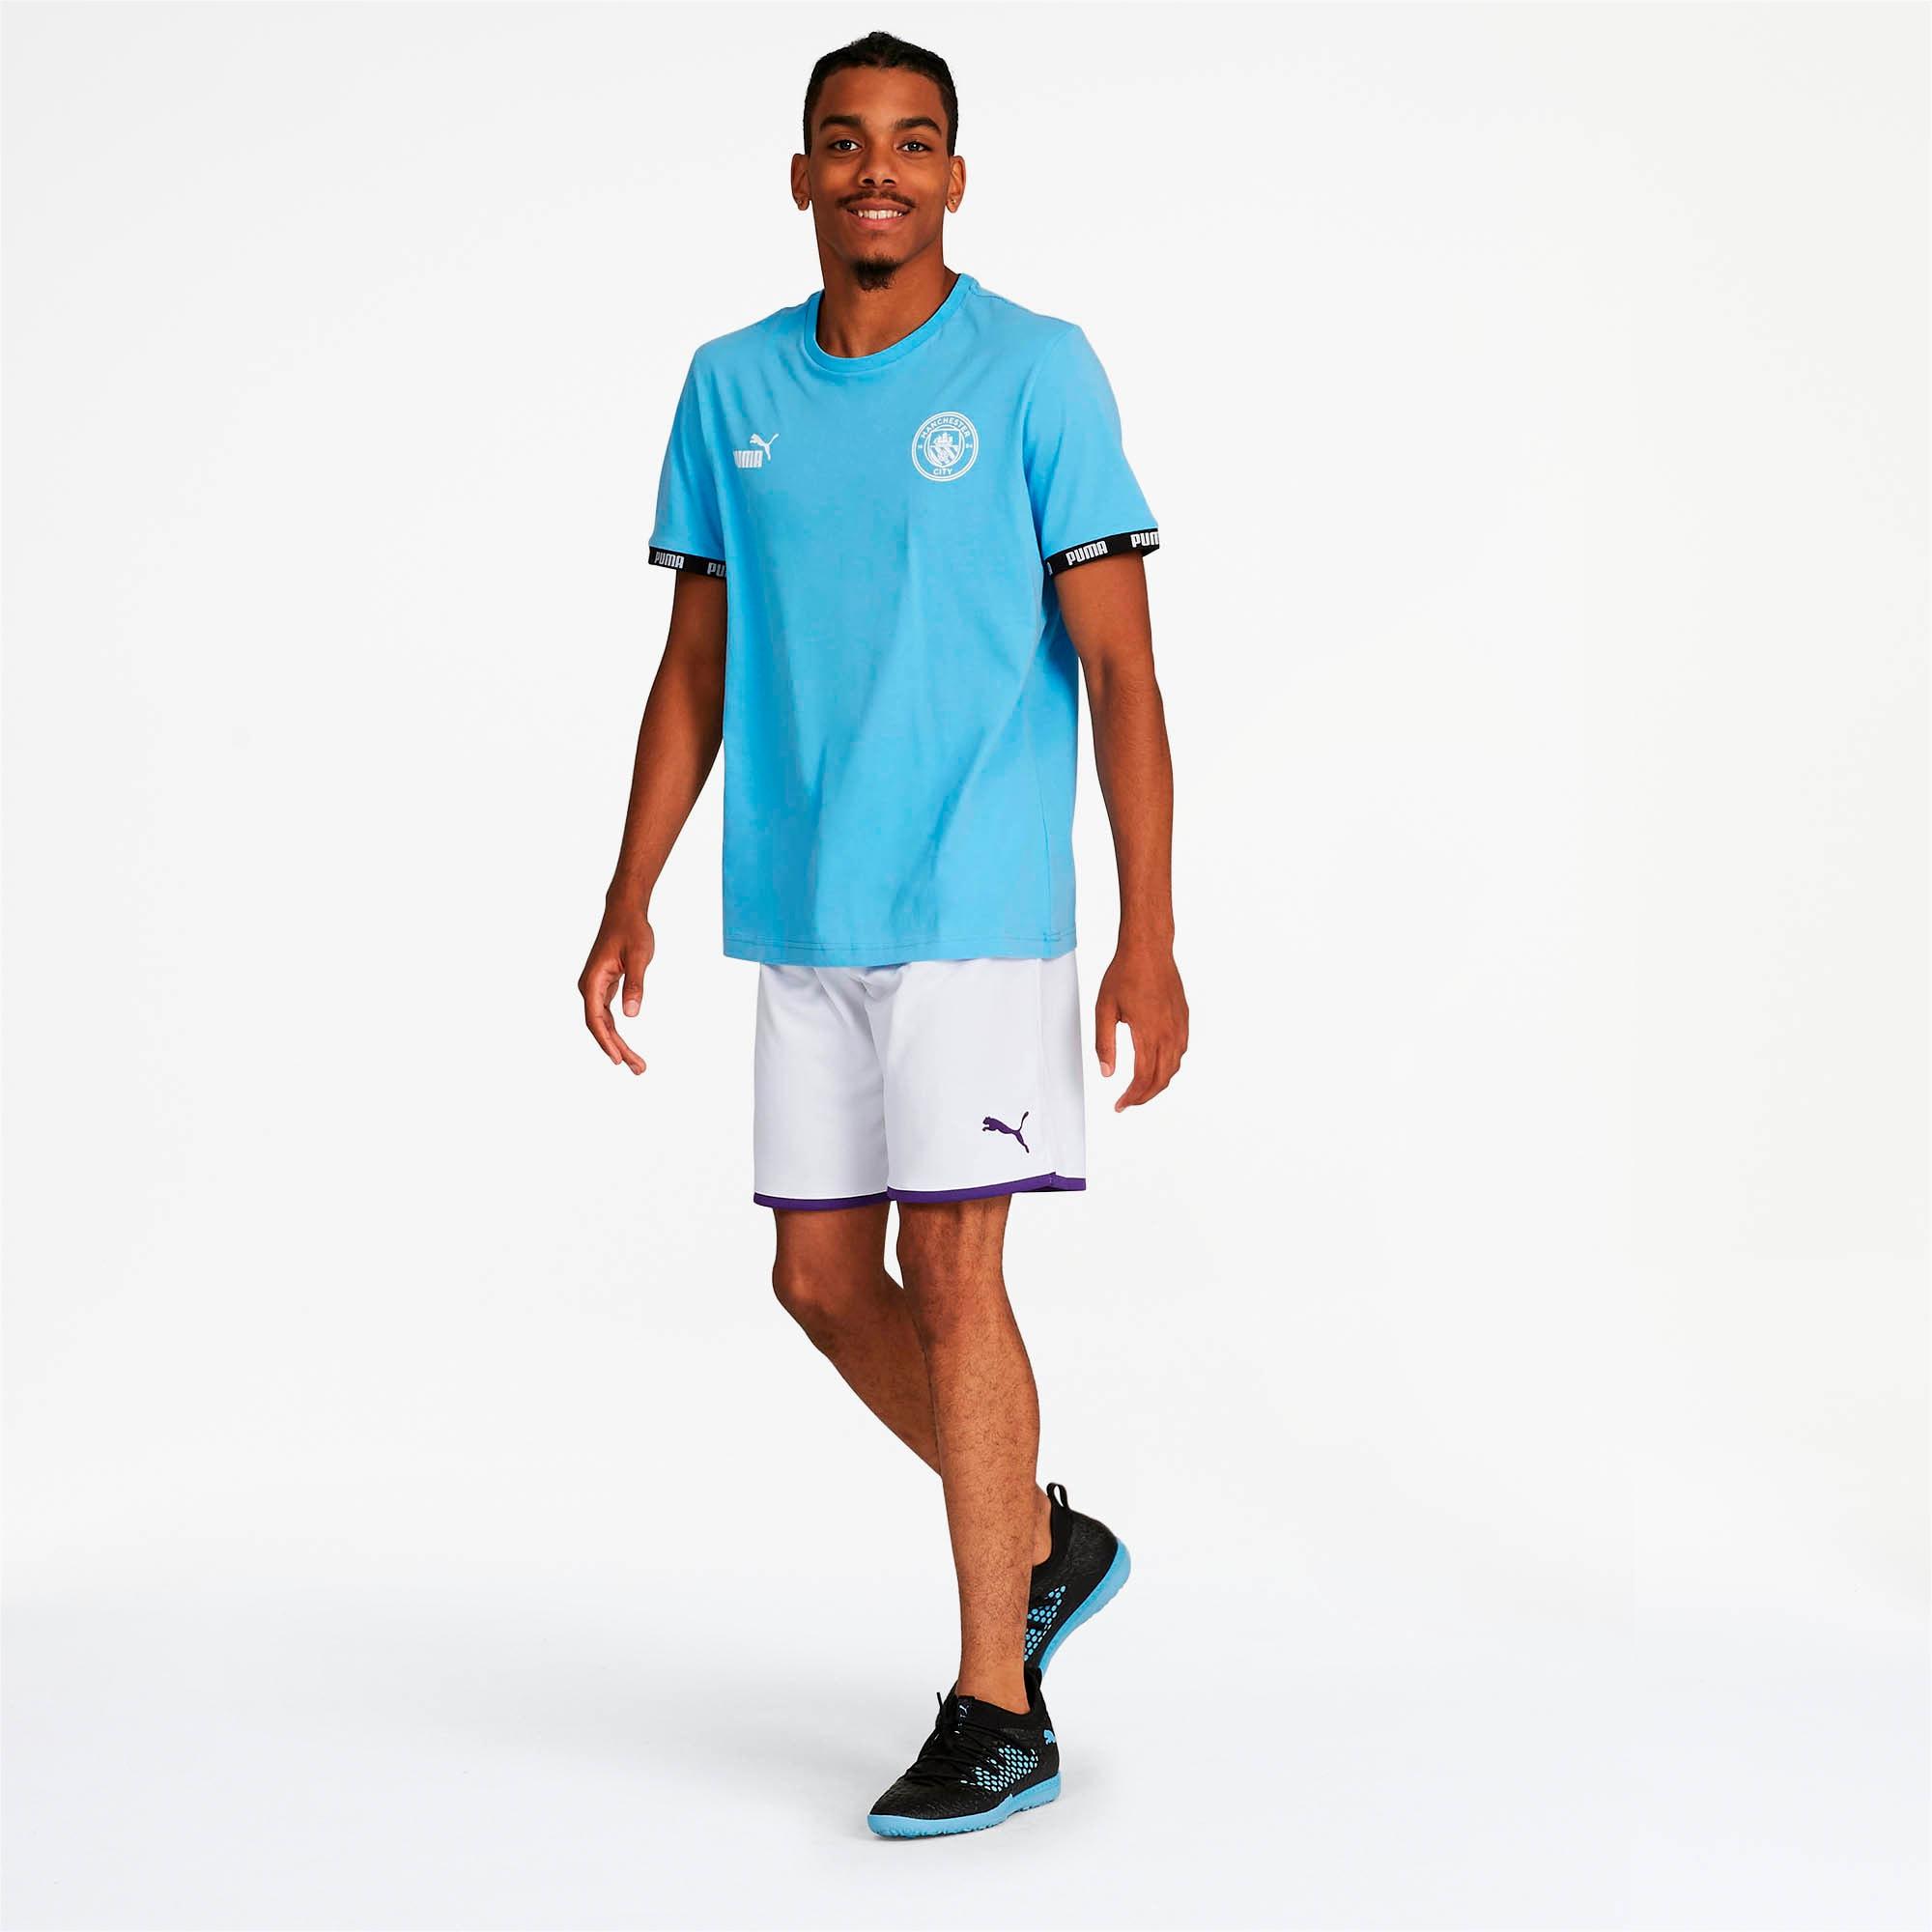 Thumbnail 3 of Manchester City Men's Third Replica Shorts, Puma White-Tillandsia Purple, medium